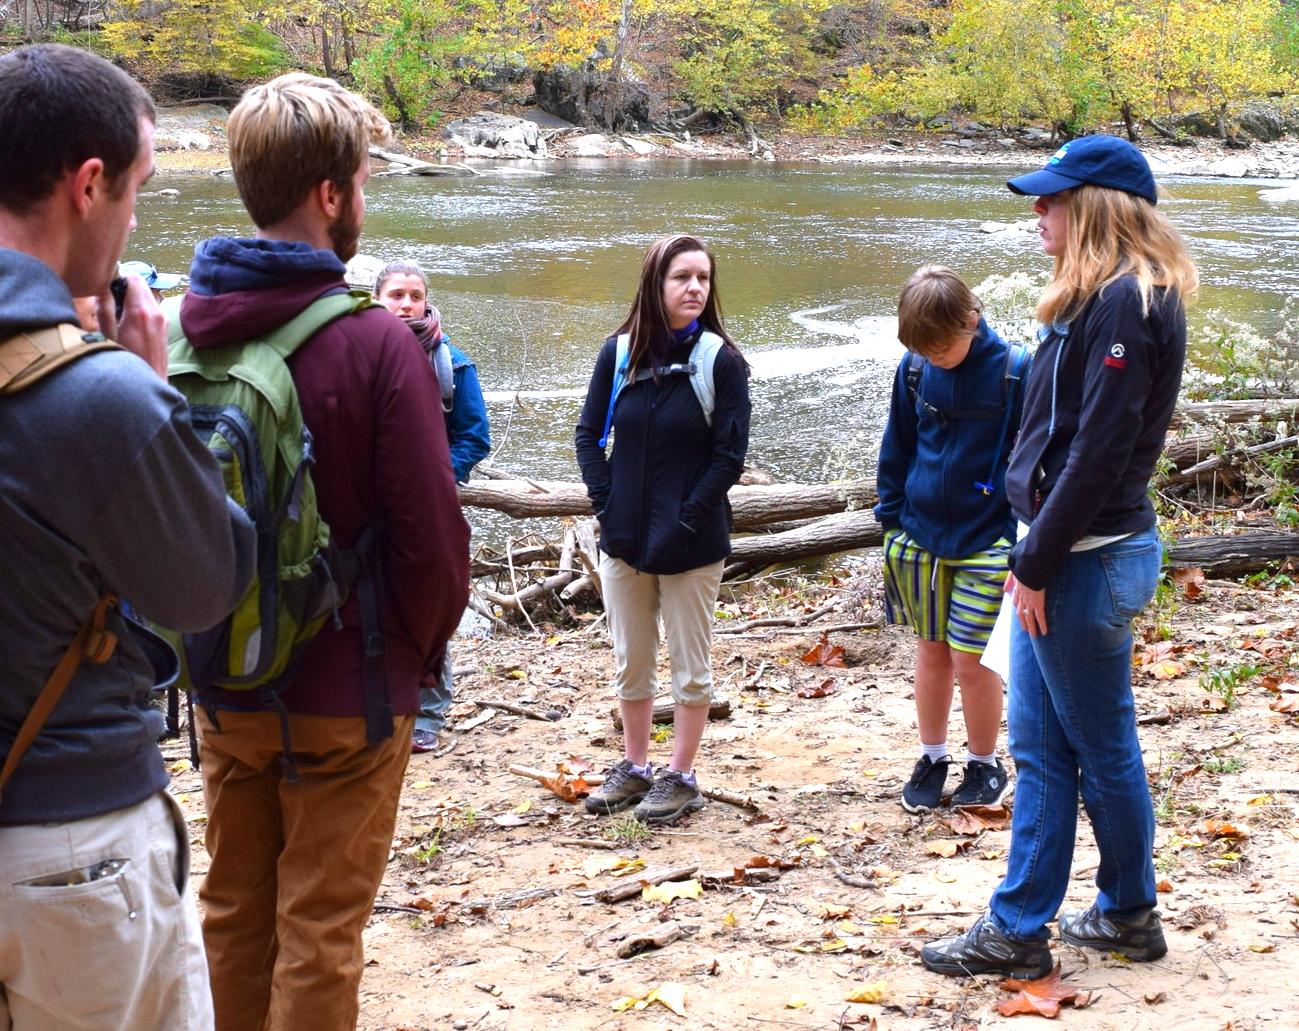 Potomac river hikers